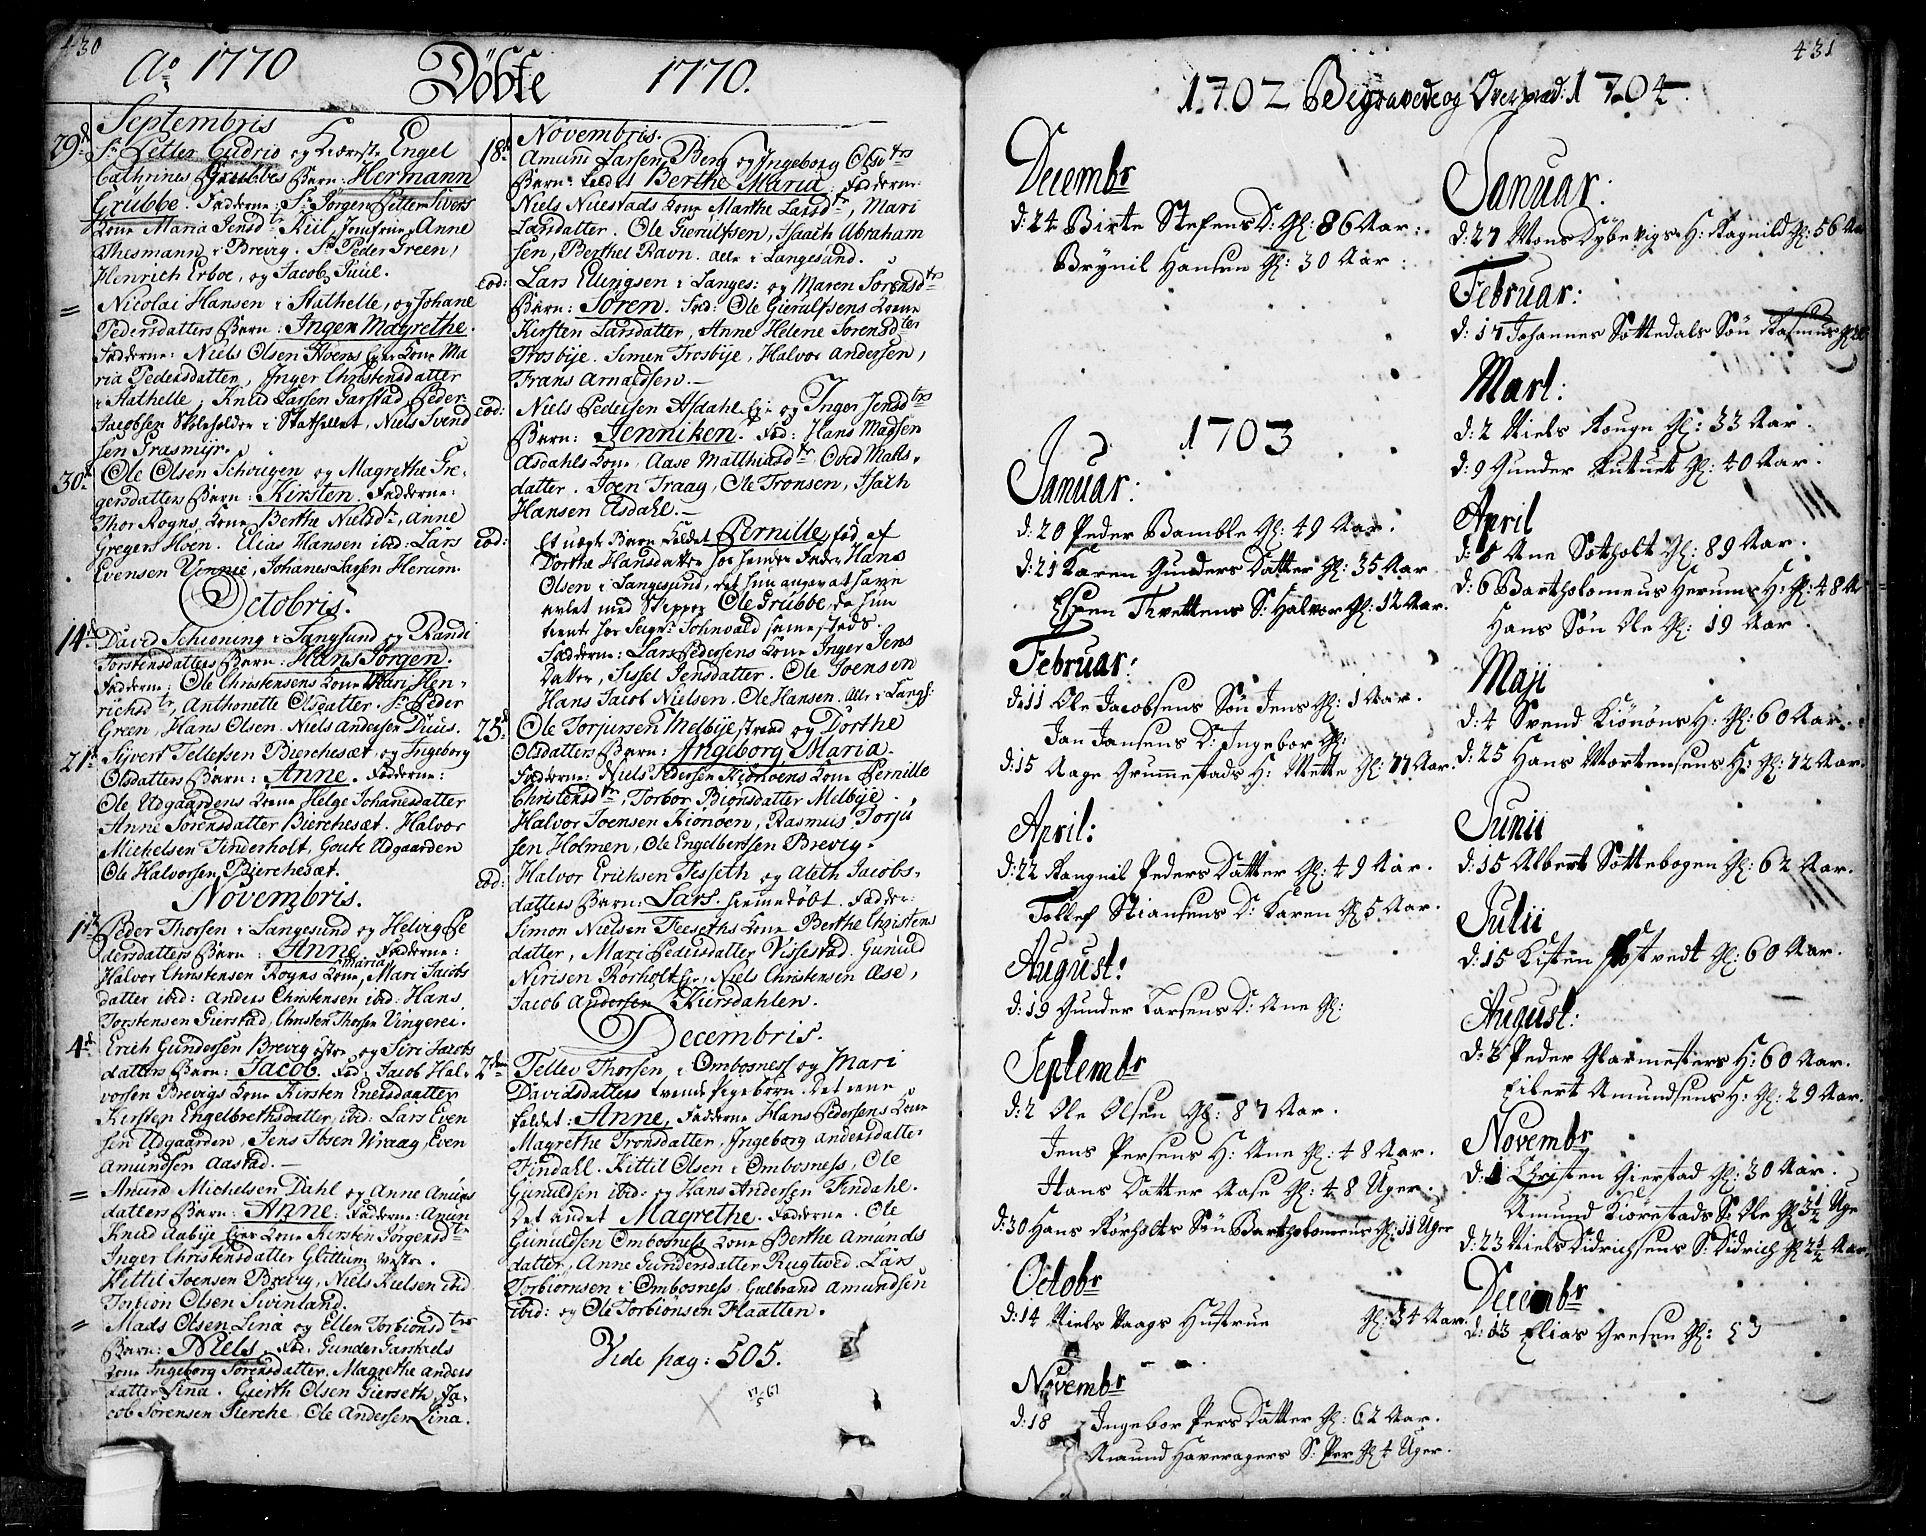 SAKO, Bamble kirkebøker, F/Fa/L0001: Ministerialbok nr. I 1, 1702-1774, s. 430-431